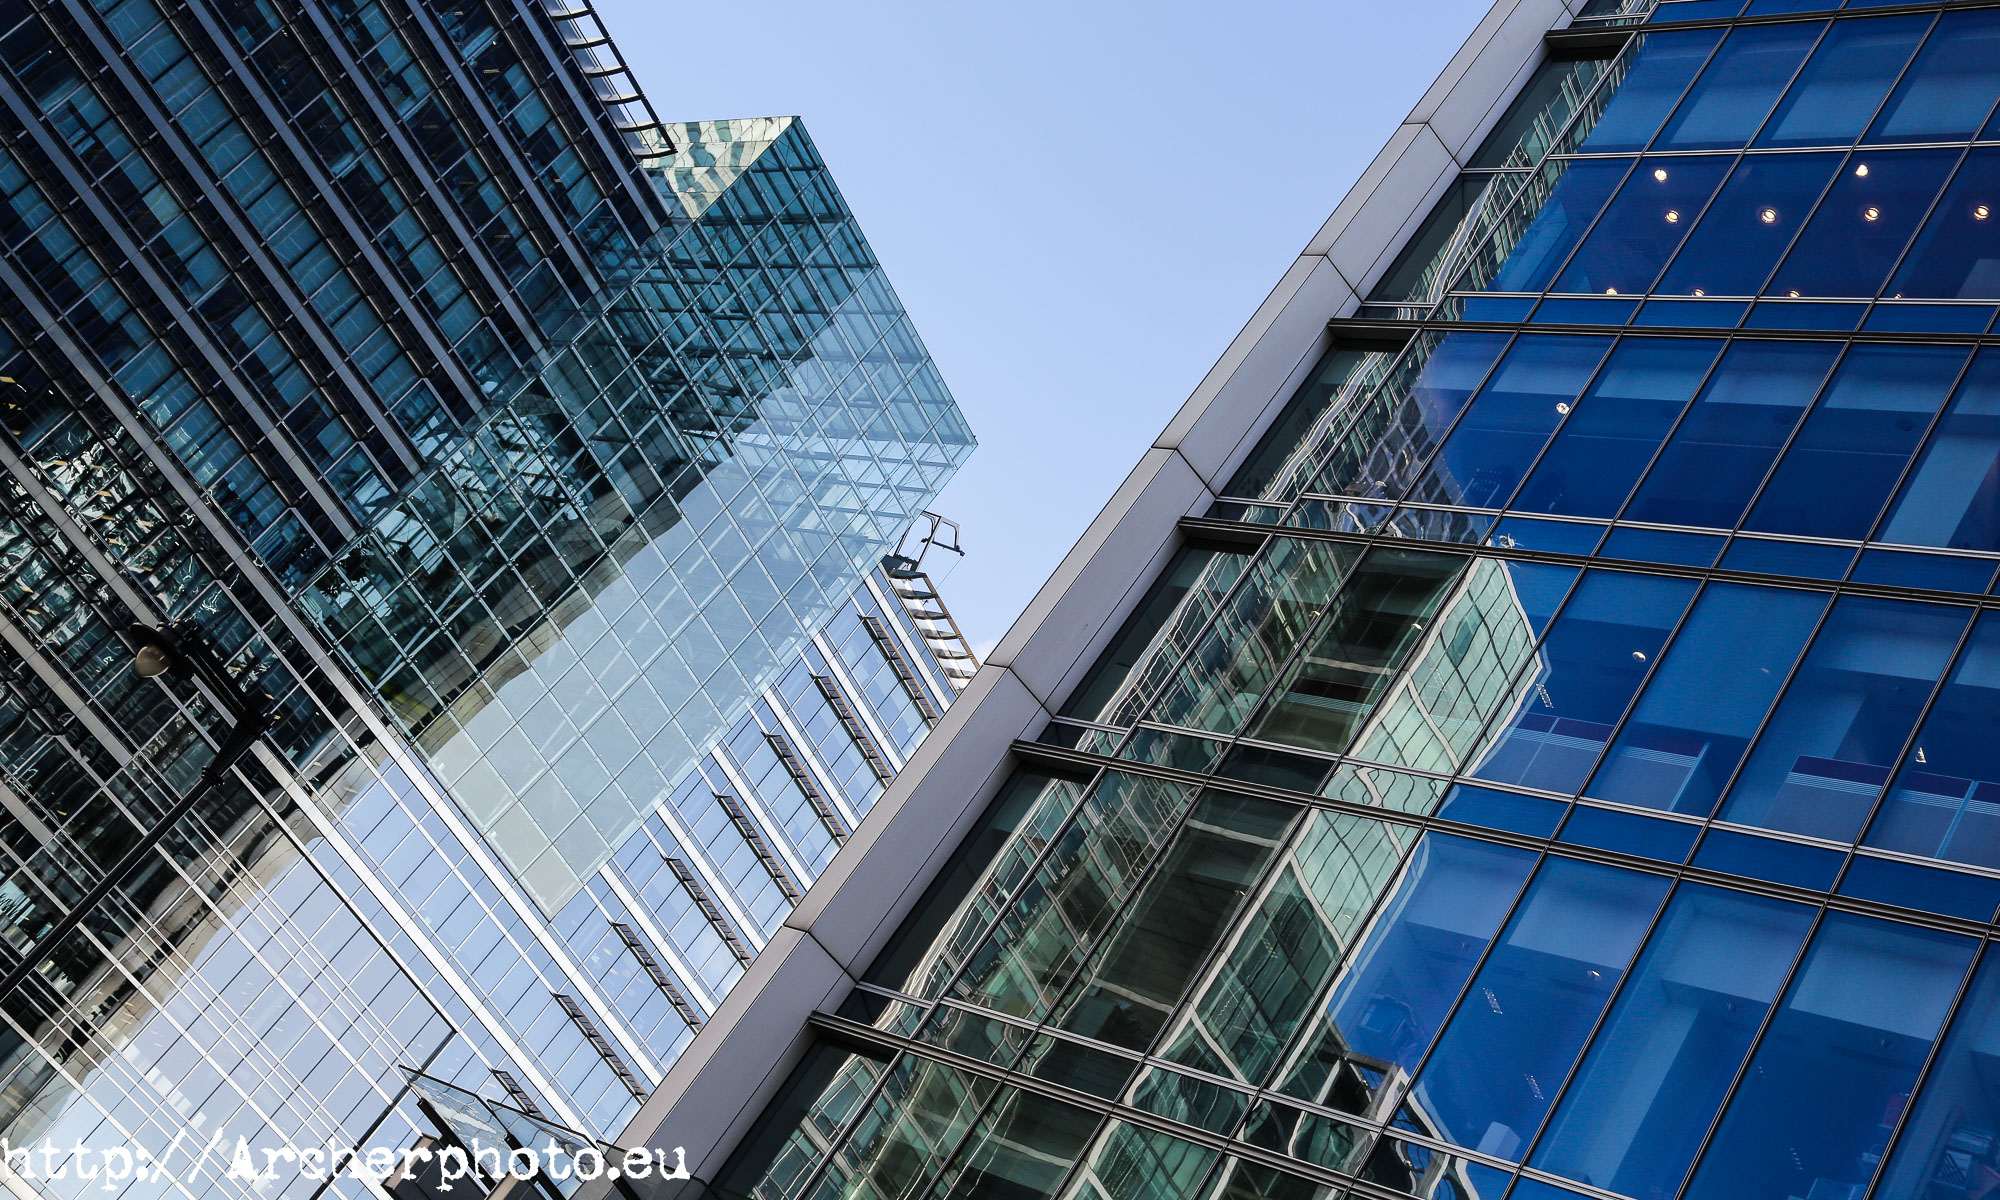 Fotografía para empresas - Canary Wharf - Archerphoto